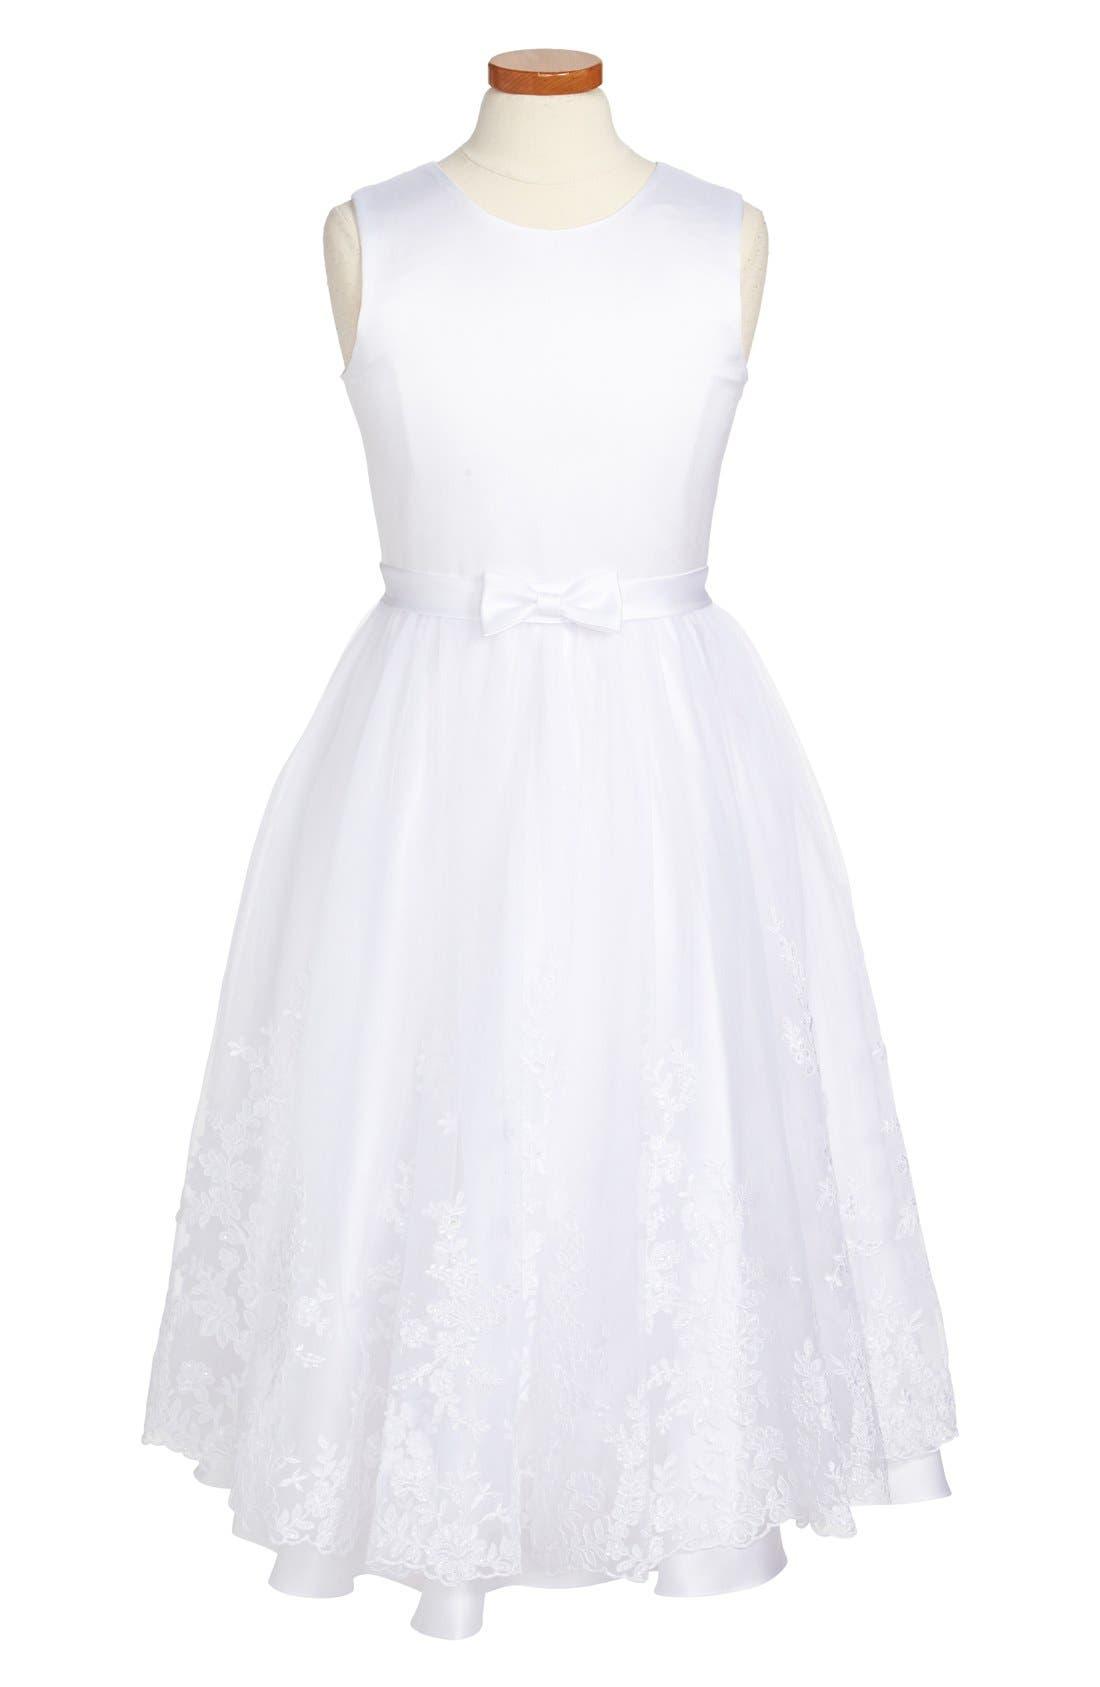 Main Image - Joan Calabrese for Mon Cheri First Communion Dress (Big Girls)